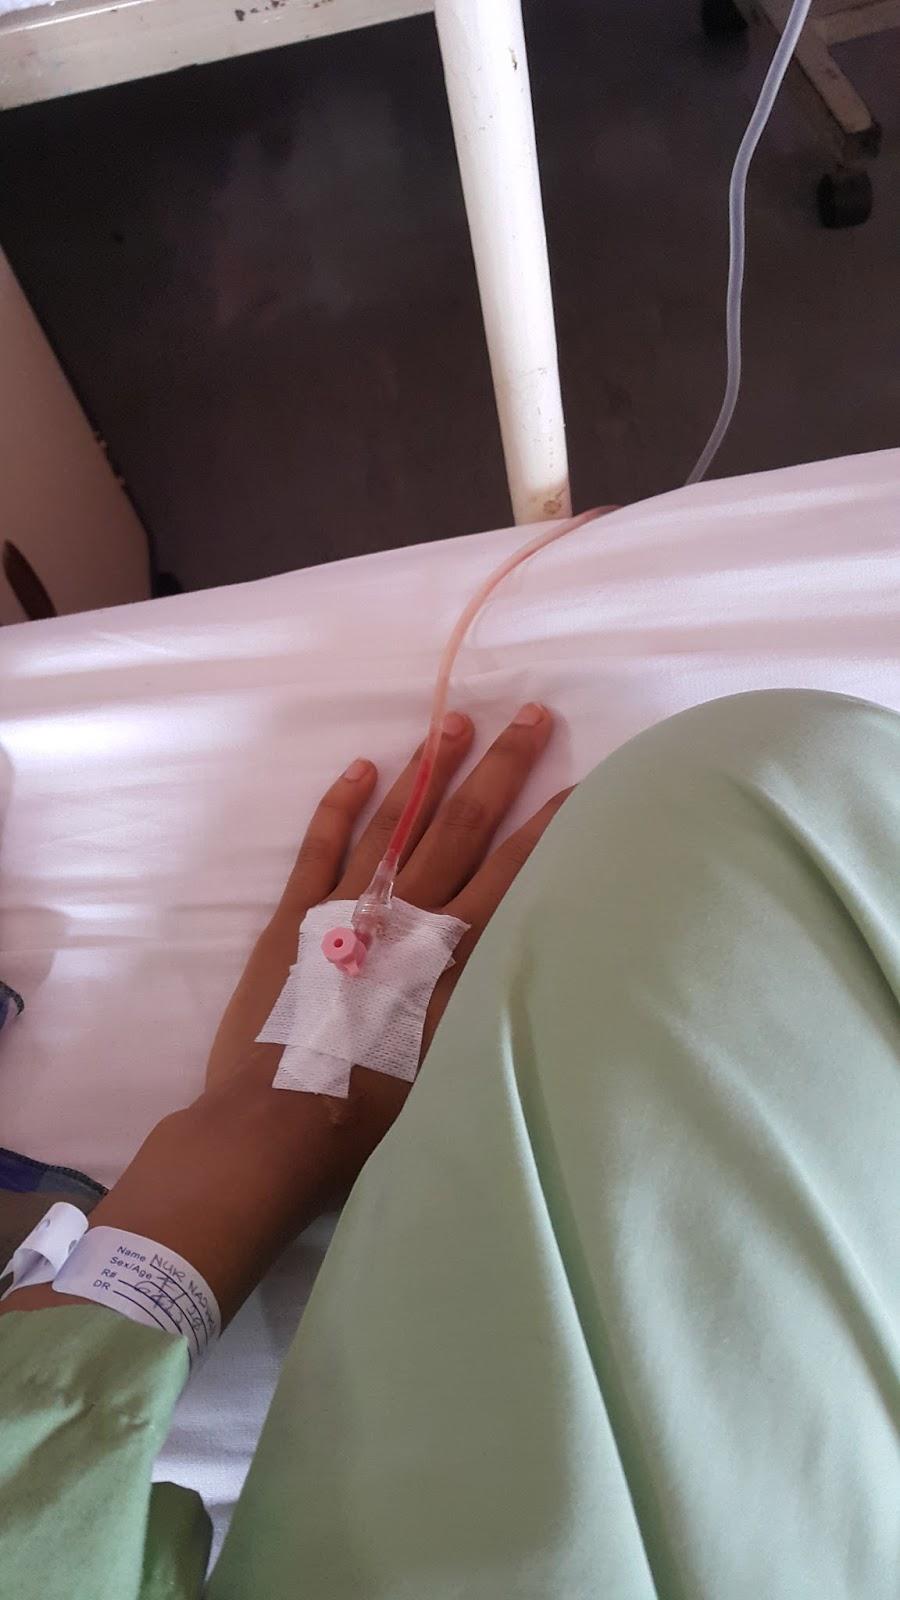 Shazika Shahrim Pengalaman Pertama Masuk Hospital